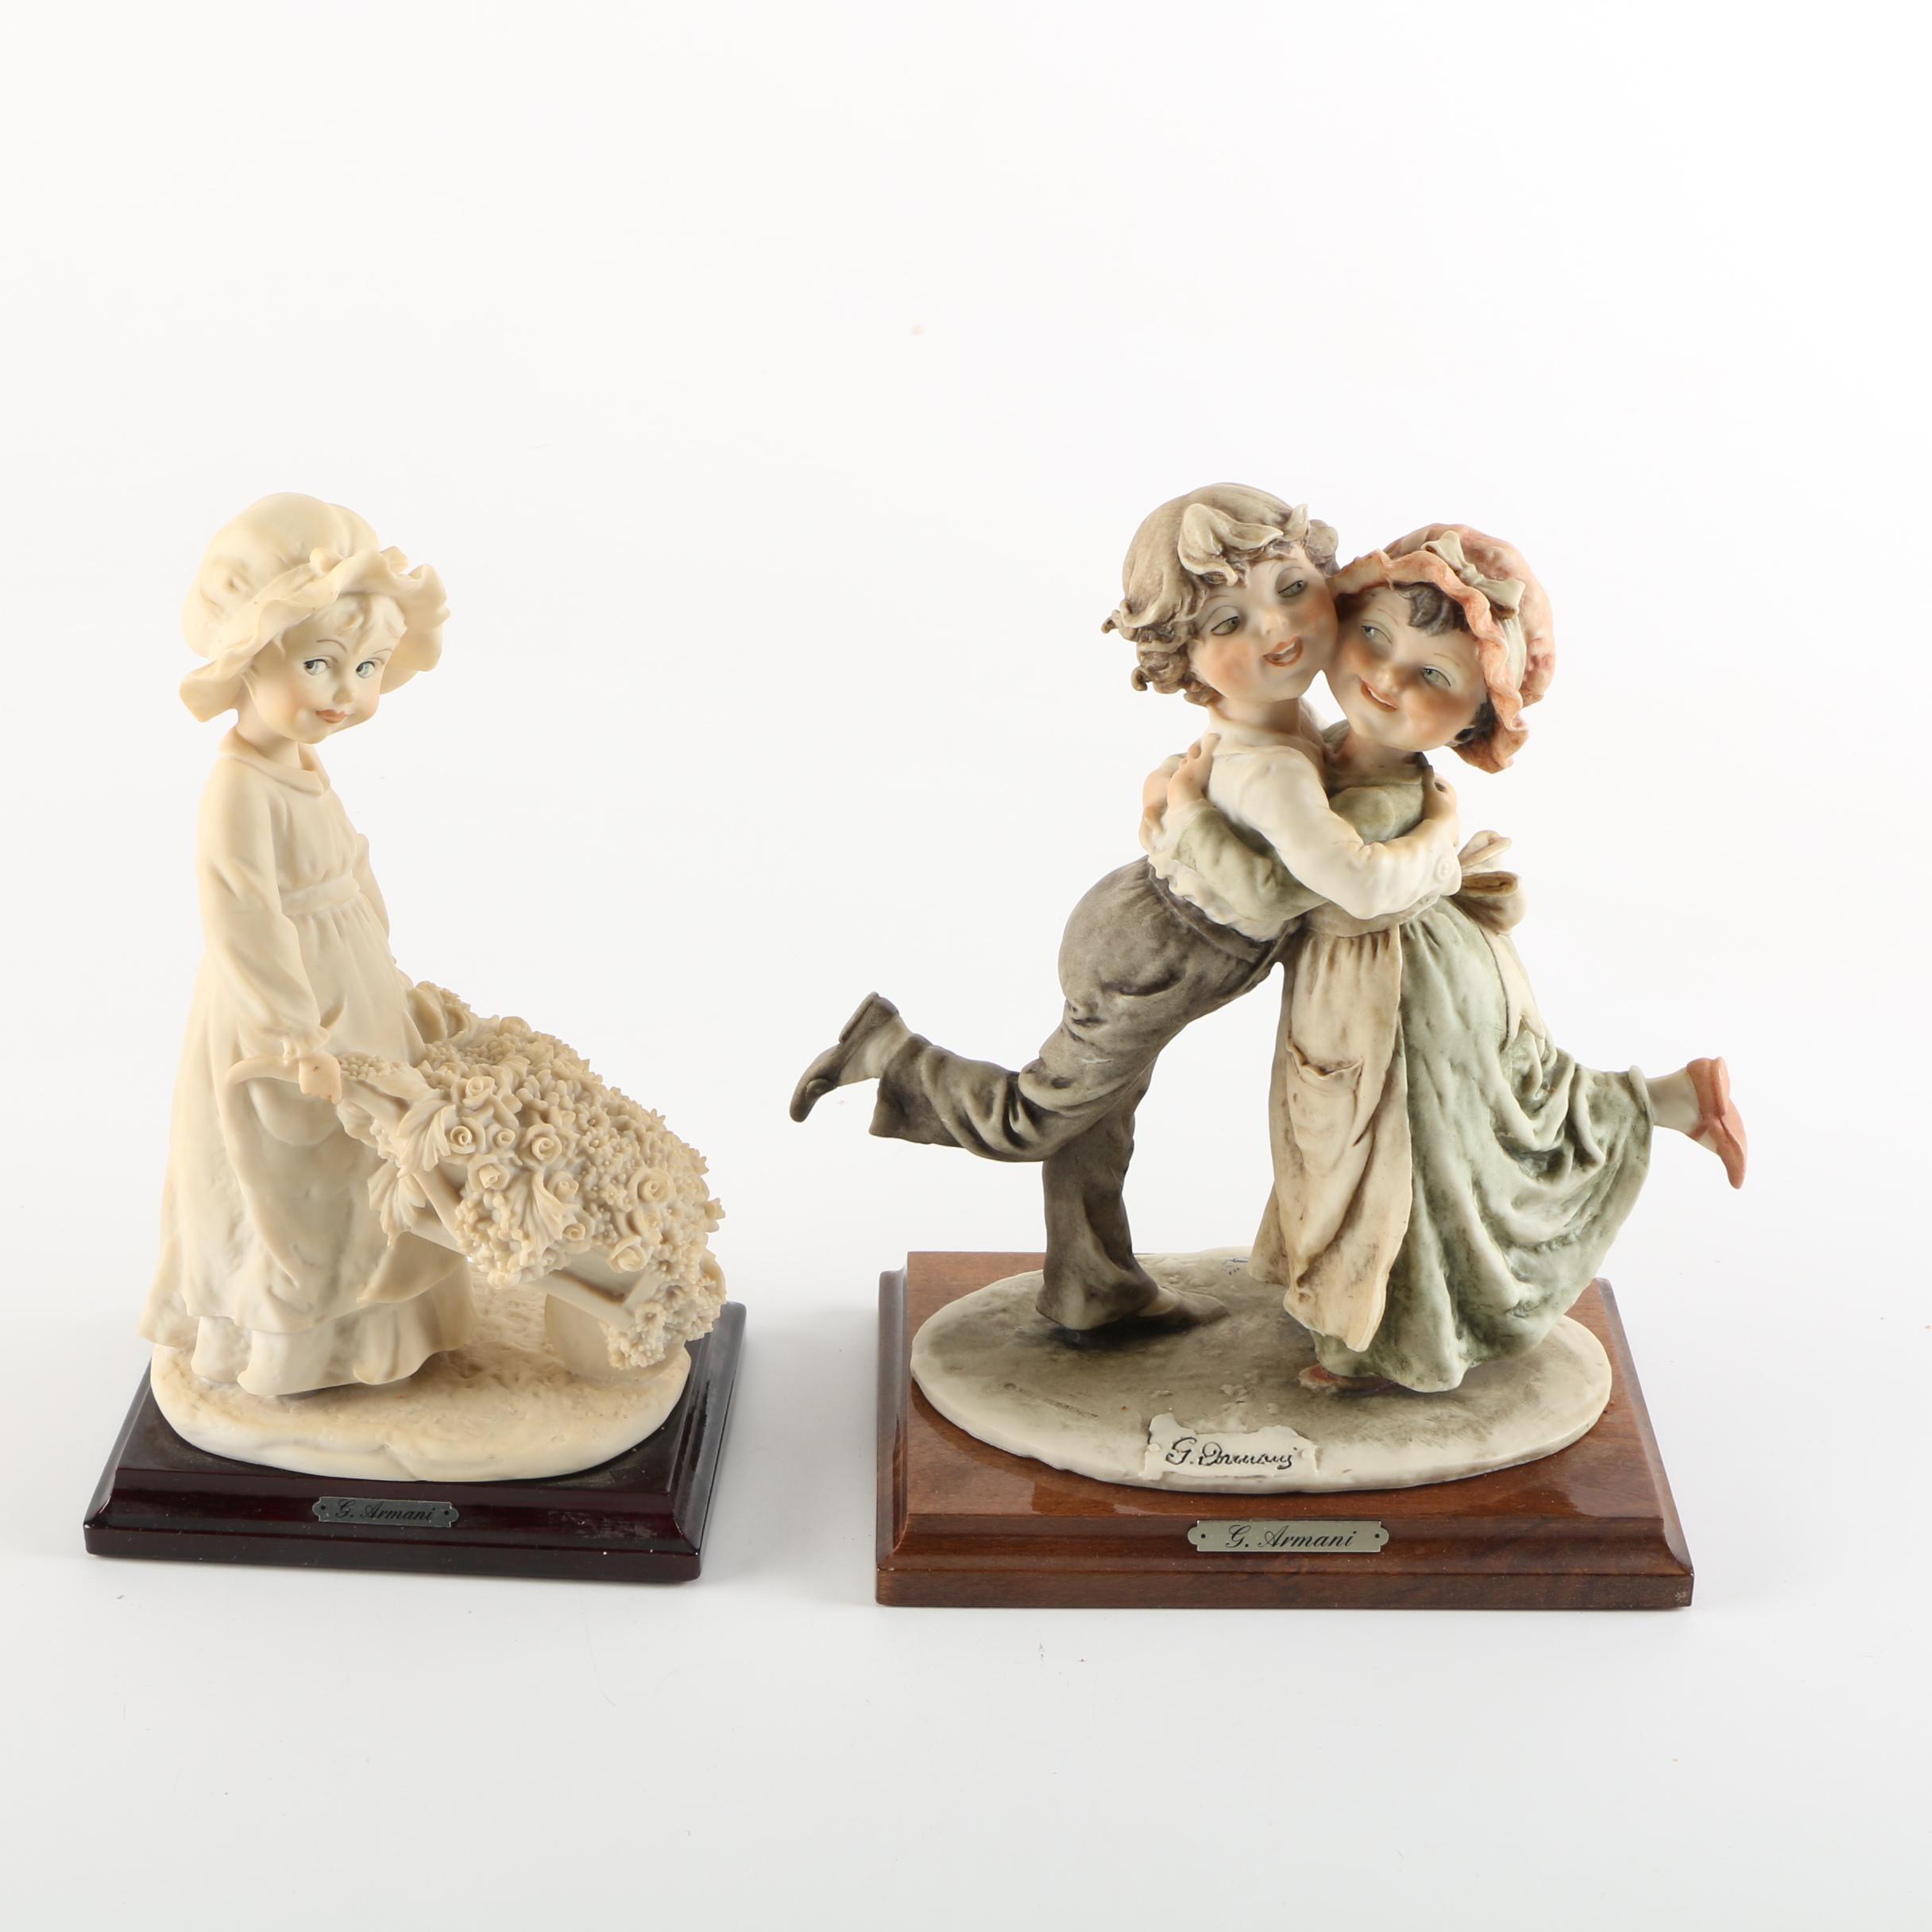 Capodimonte G. Armani Porcelain Figurines of Children